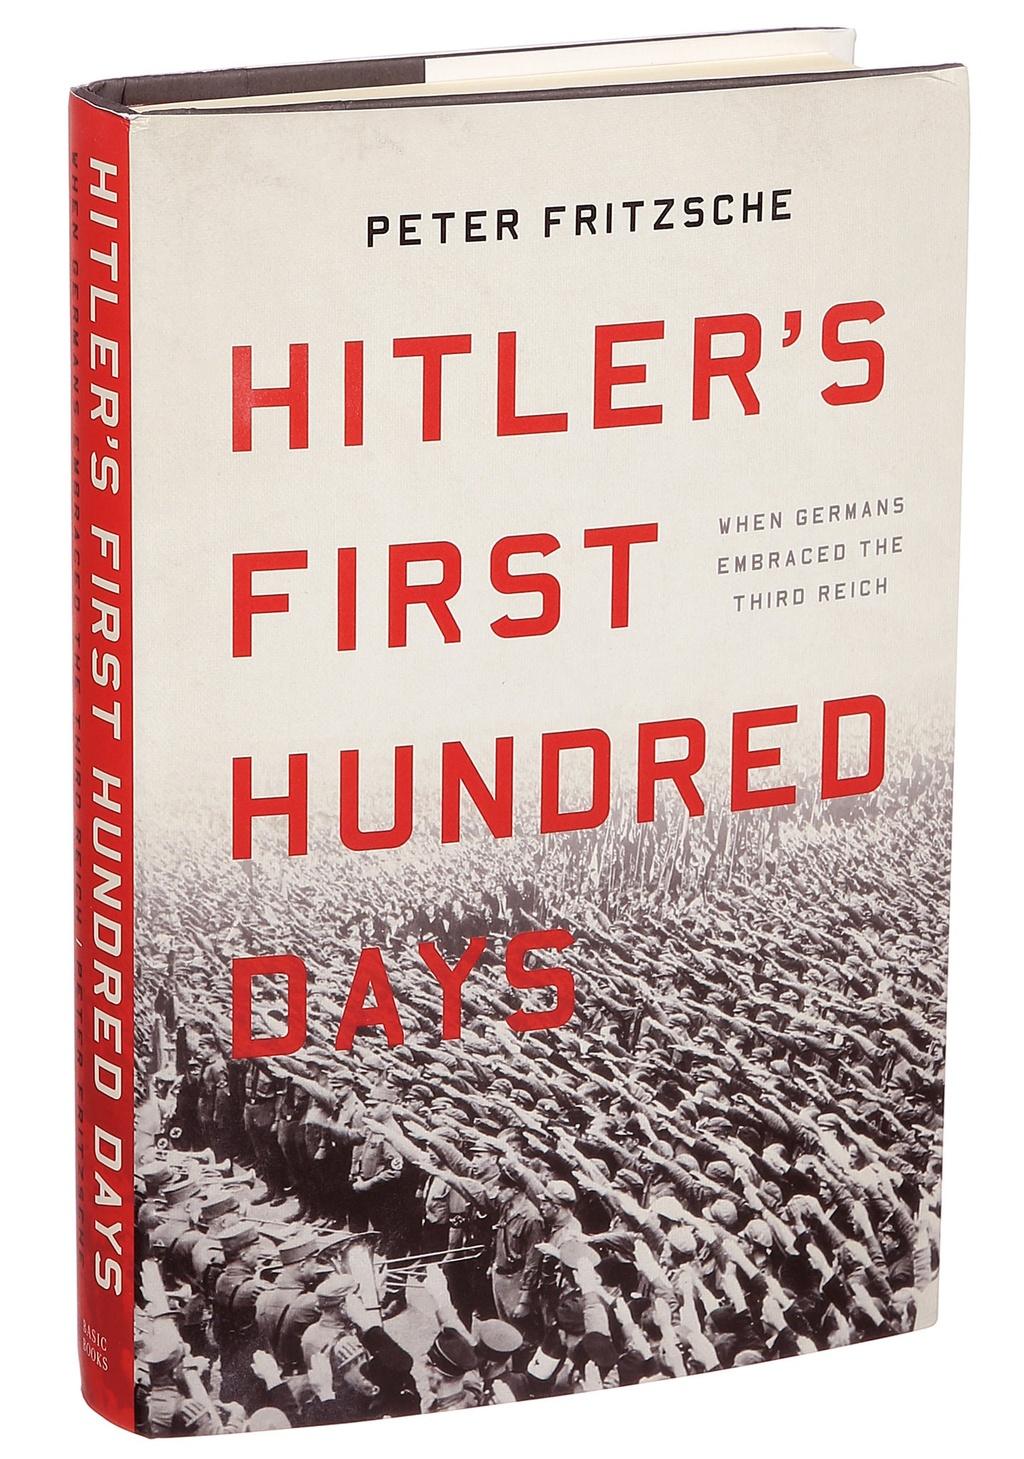 100 ngay Hitler va Duc Quoc xa rung chuyen nuoc Duc hinh anh 1 18bookfritzsche1_superJumbo.jpg